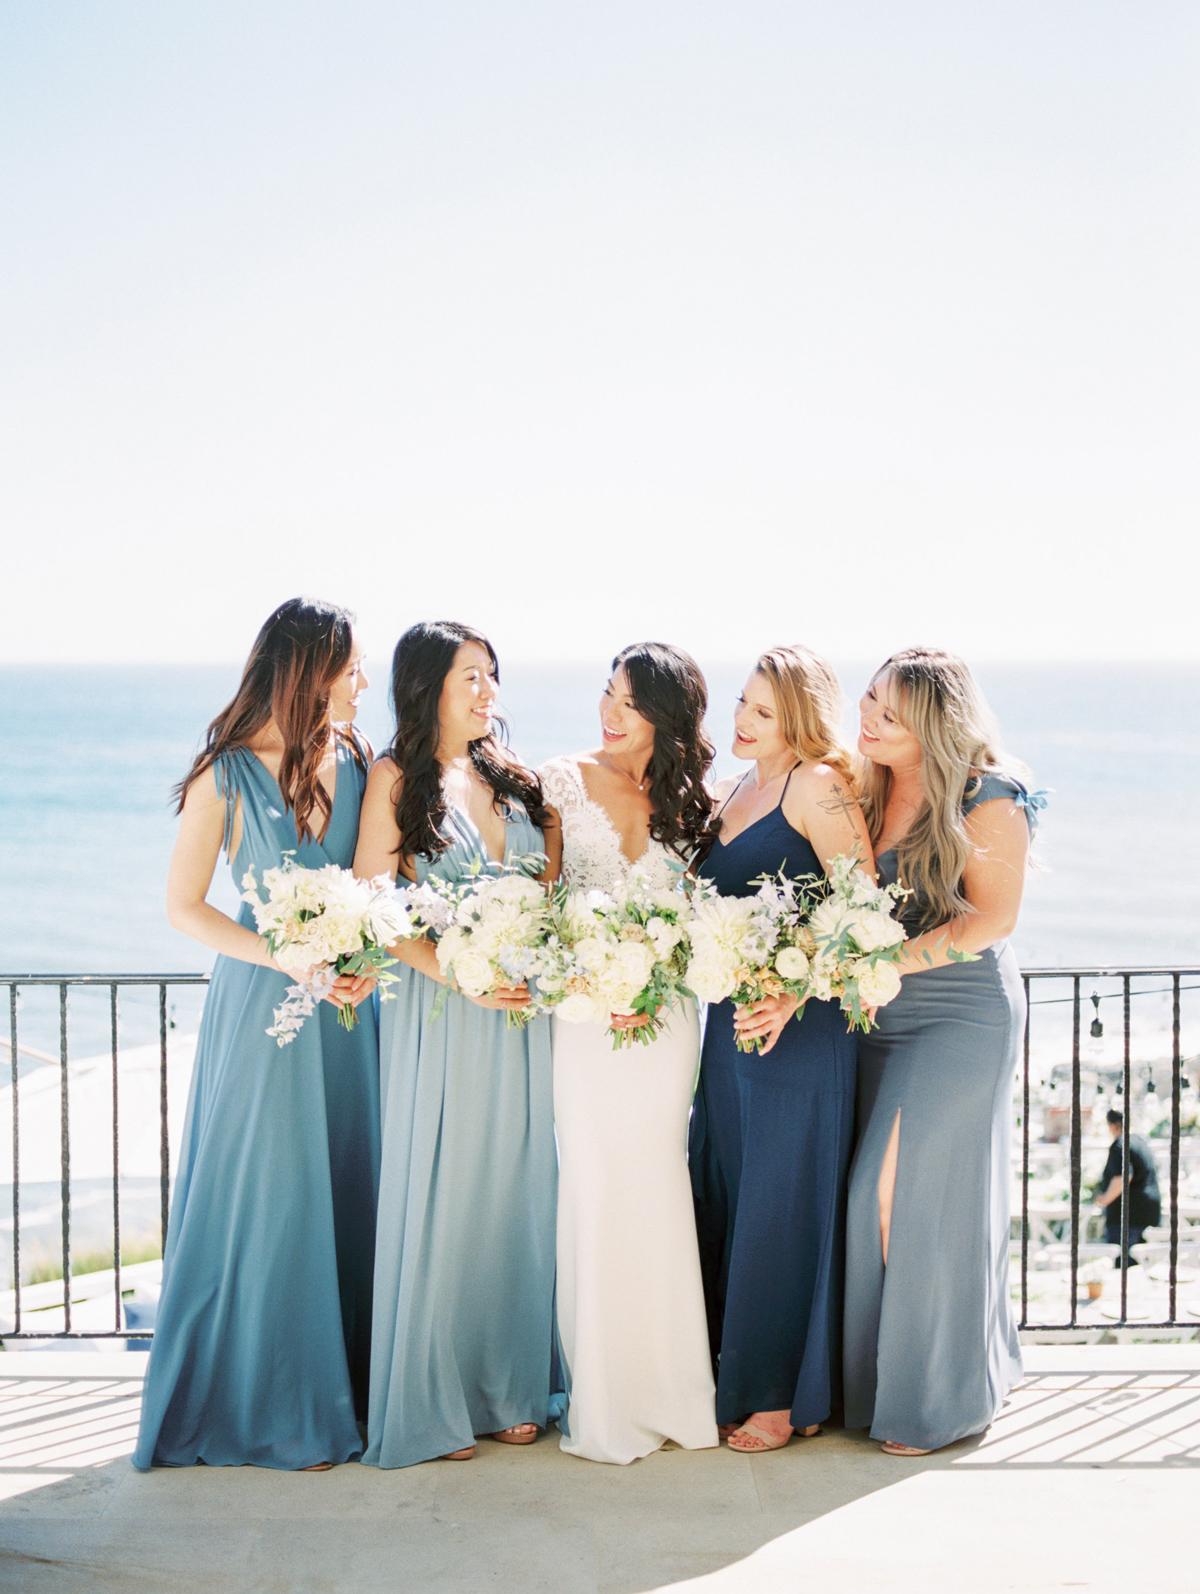 bettina gino wedding bridesmaids in blue on balcony